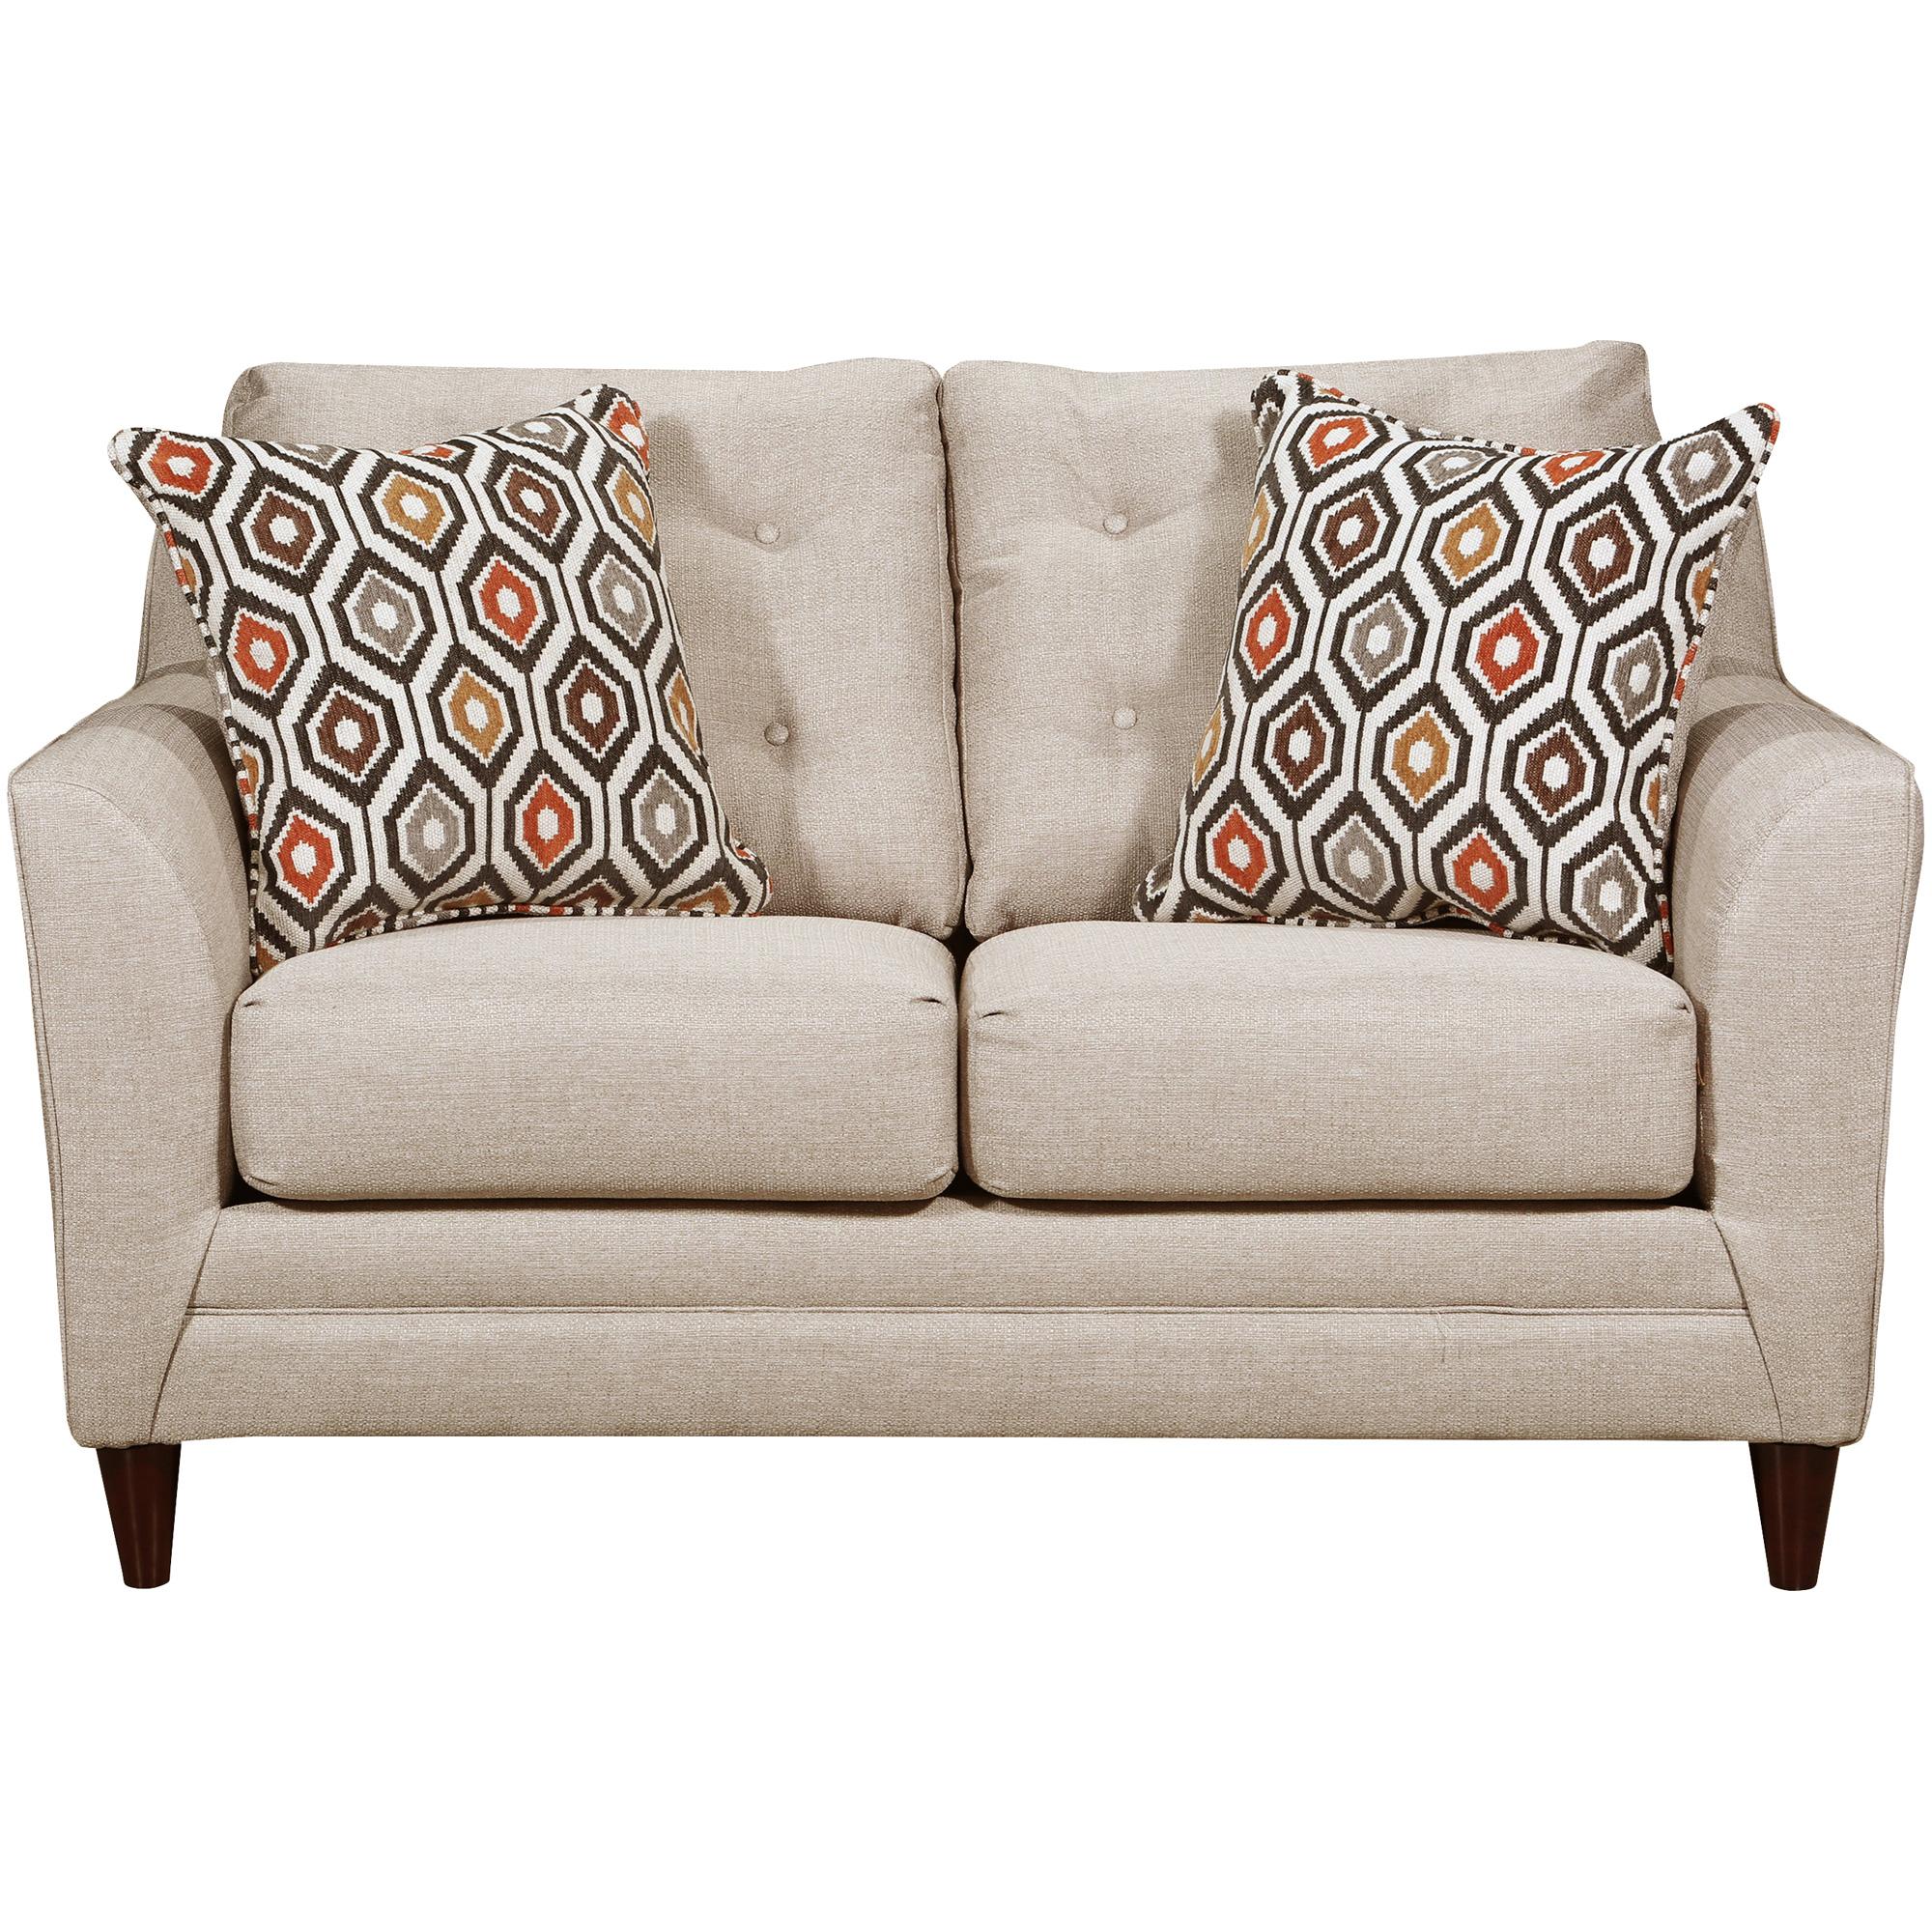 Lane Home Furnishings | Cink Linen Loveseat Sofa